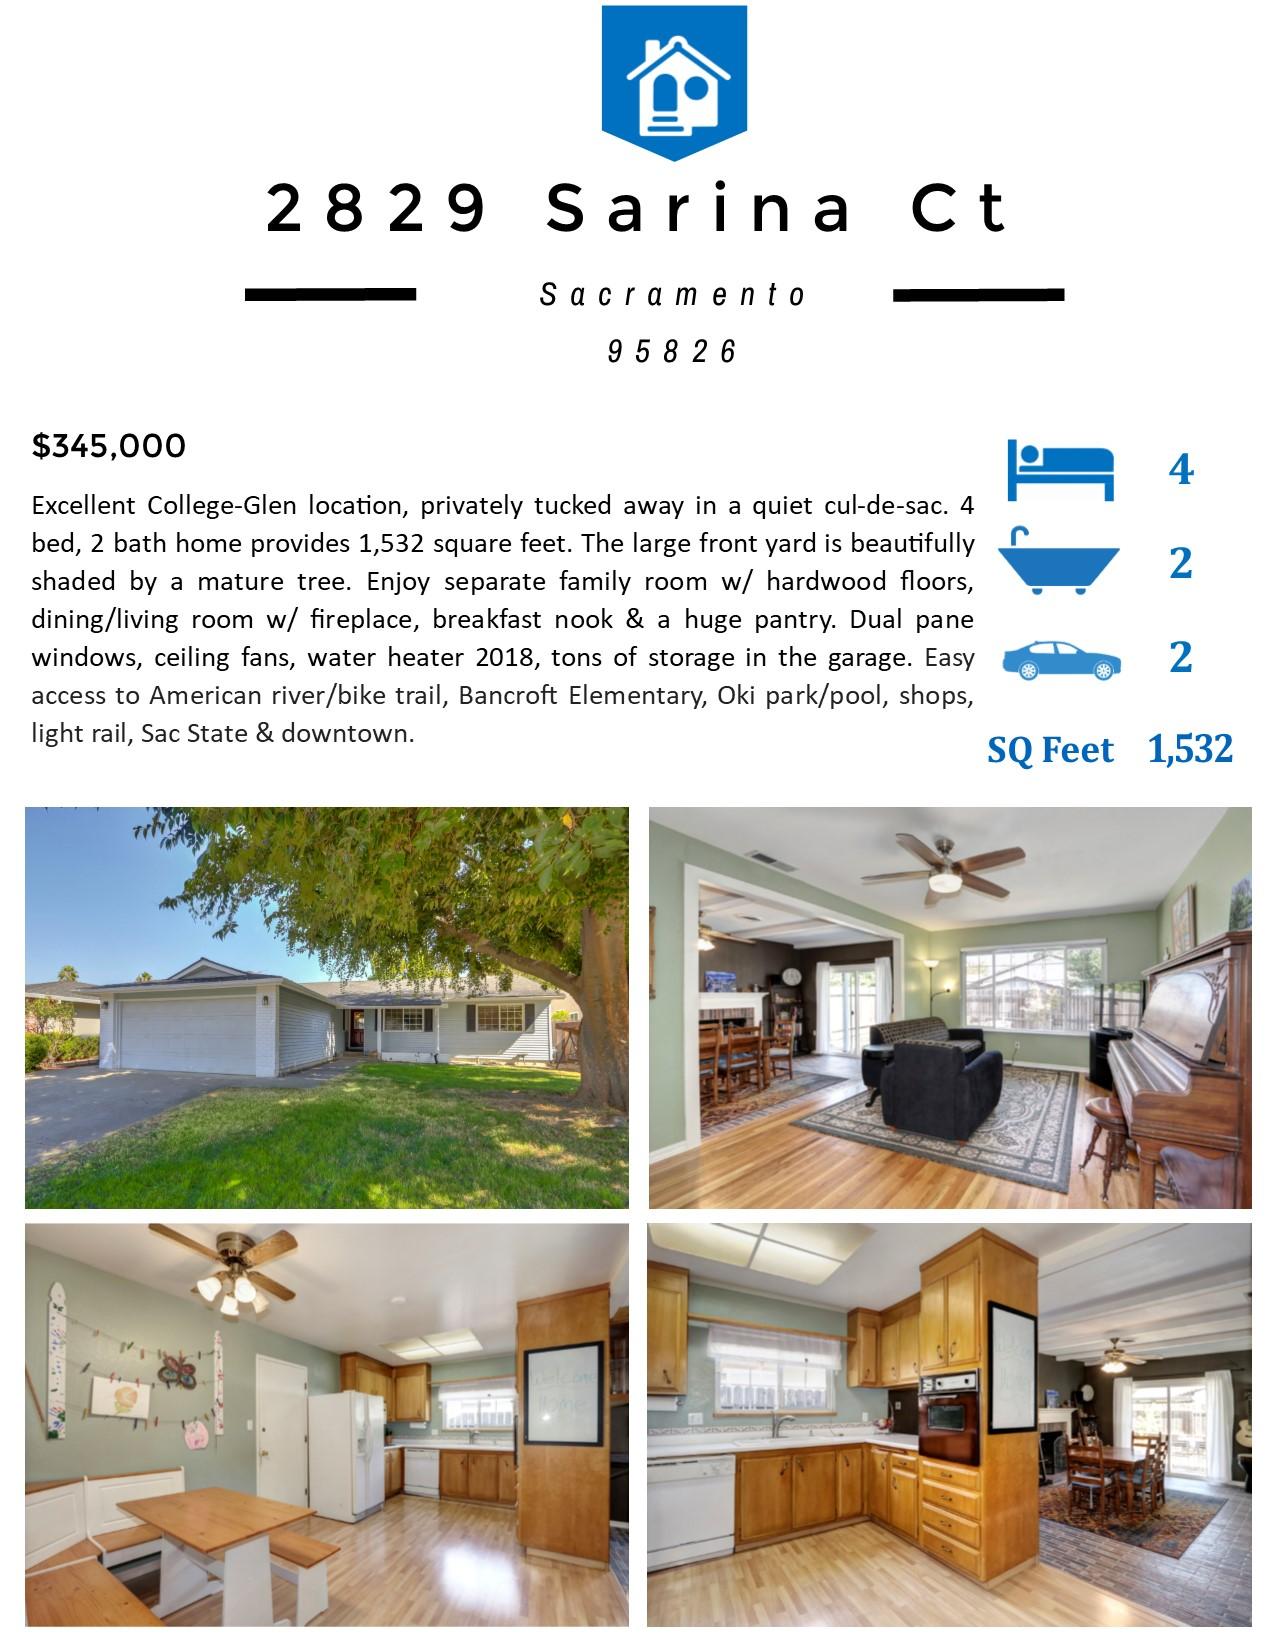 Flyer Back - 2828 Sarina Ct Sacramento CA 95826.jpg